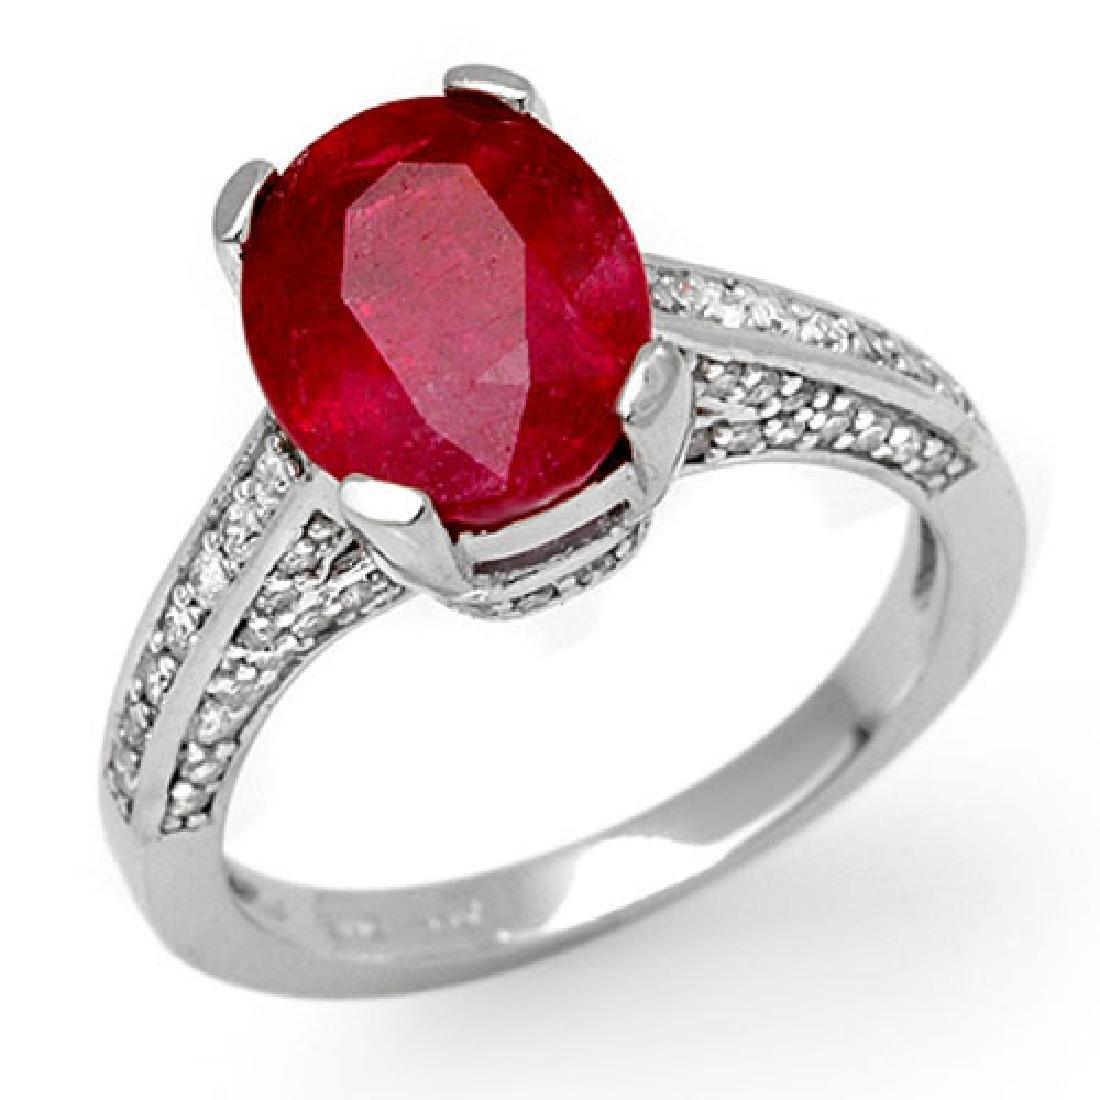 5.0 CTW Ruby & Diamond Ring 10K White Gold